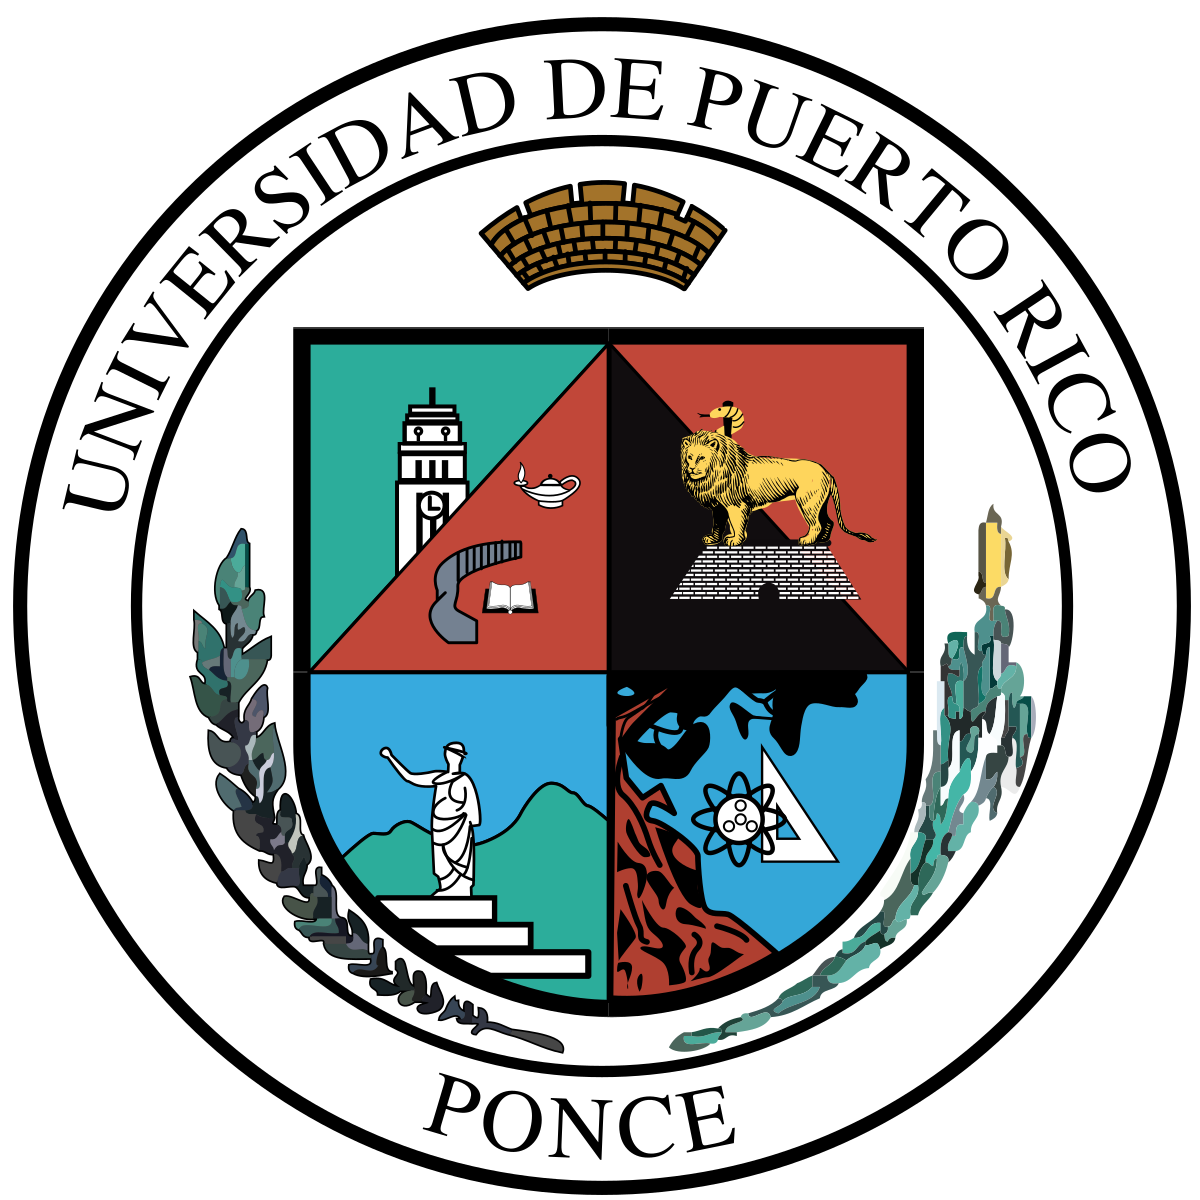 Puerto rico baseball clipart clipart royalty free University of Puerto Rico at Ponce - Wikipedia clipart royalty free